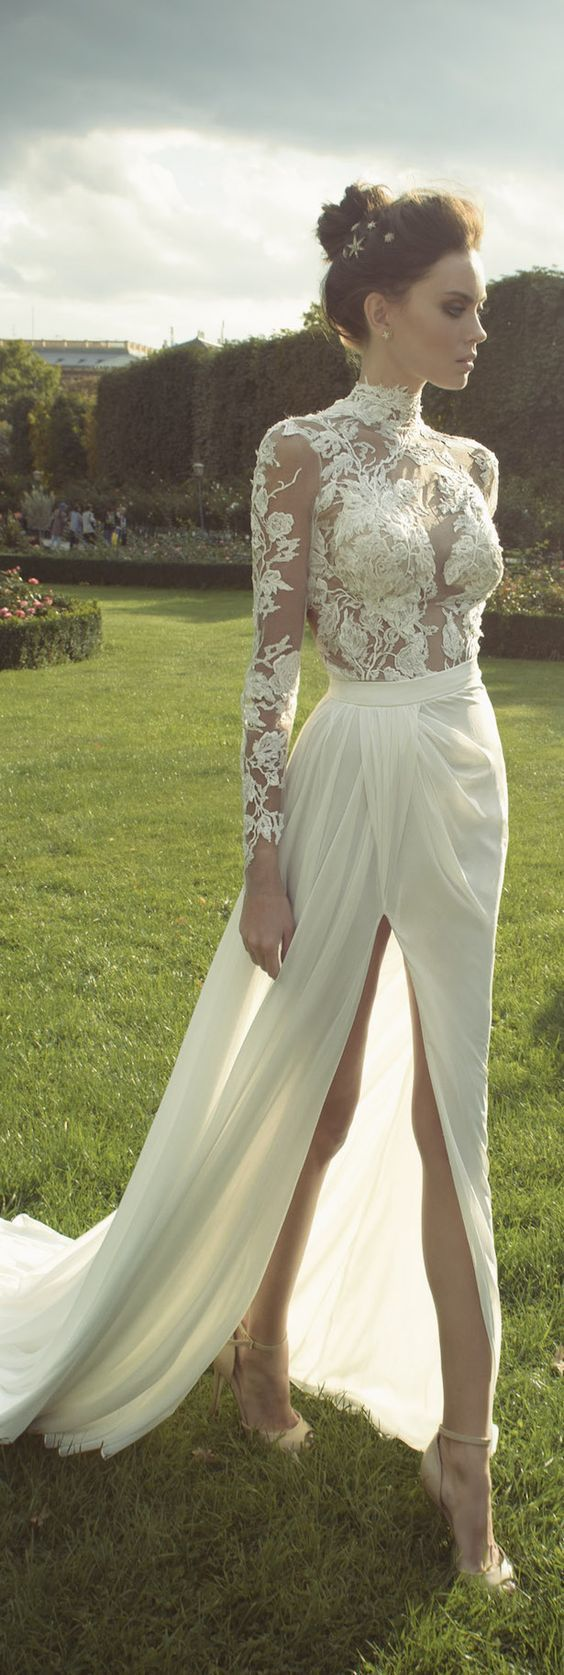 lace collar wedding dress